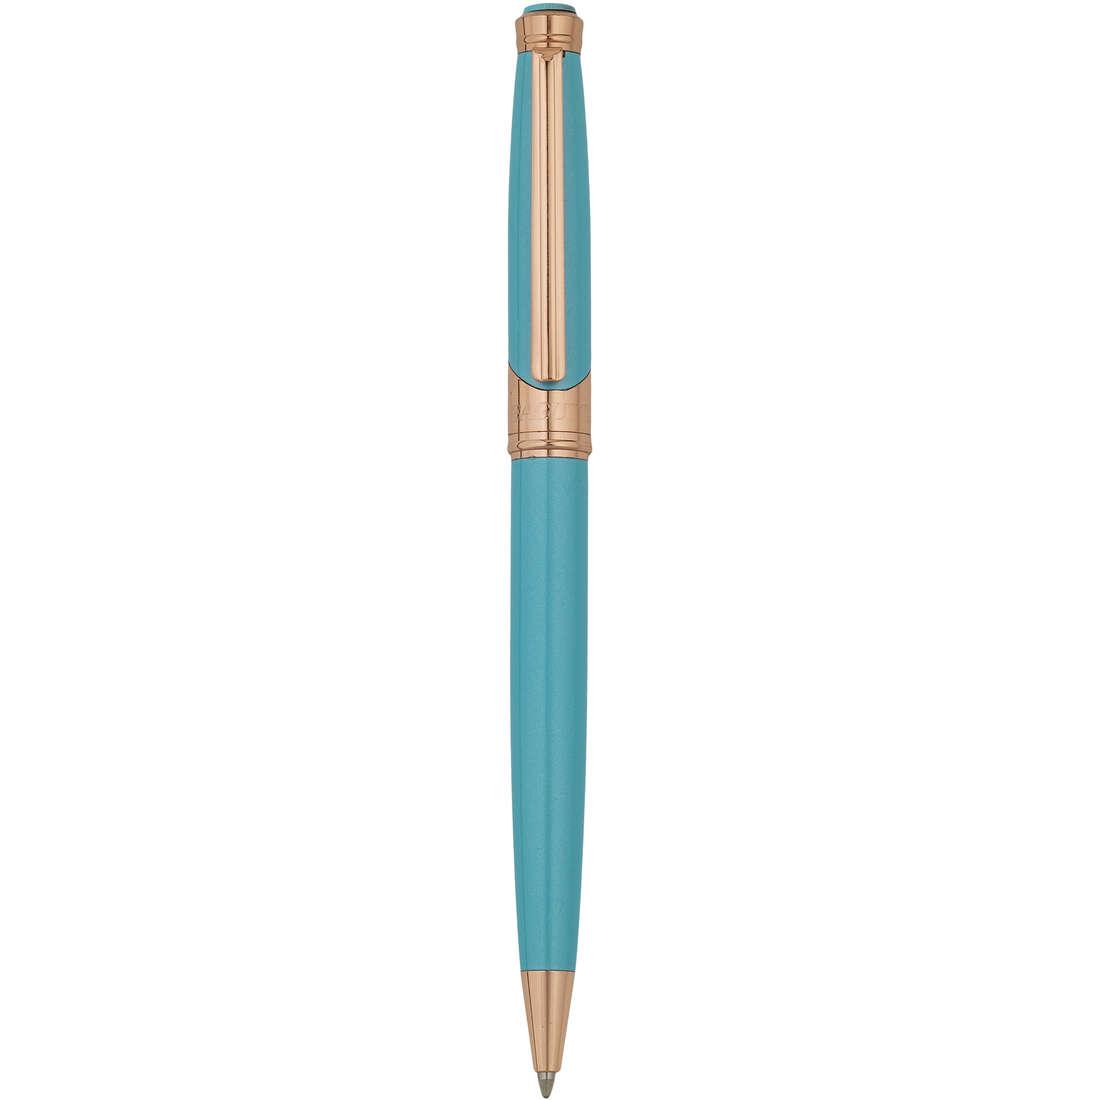 penna unisex gioielli Bagutta Penne H 6009-02 B